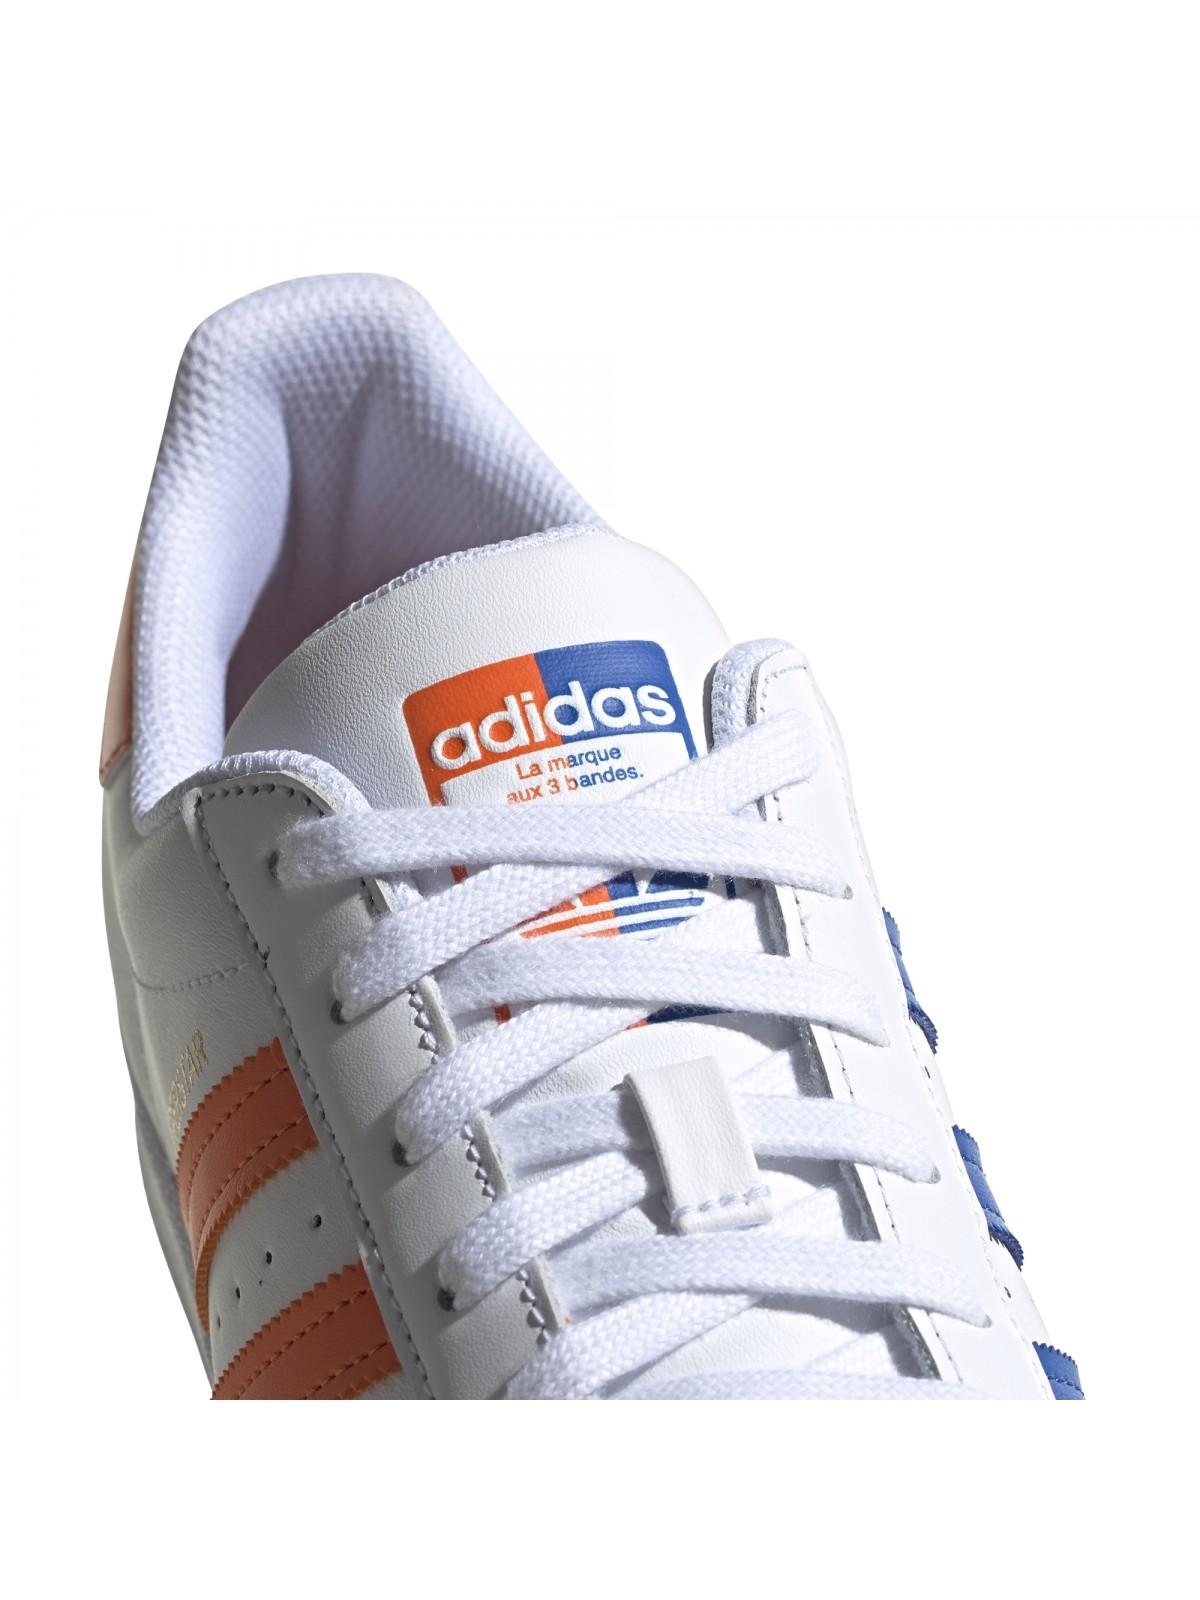 ADIDAS Superstar cuir bicolore orange / bleu - Superstar - ADIDAS ...